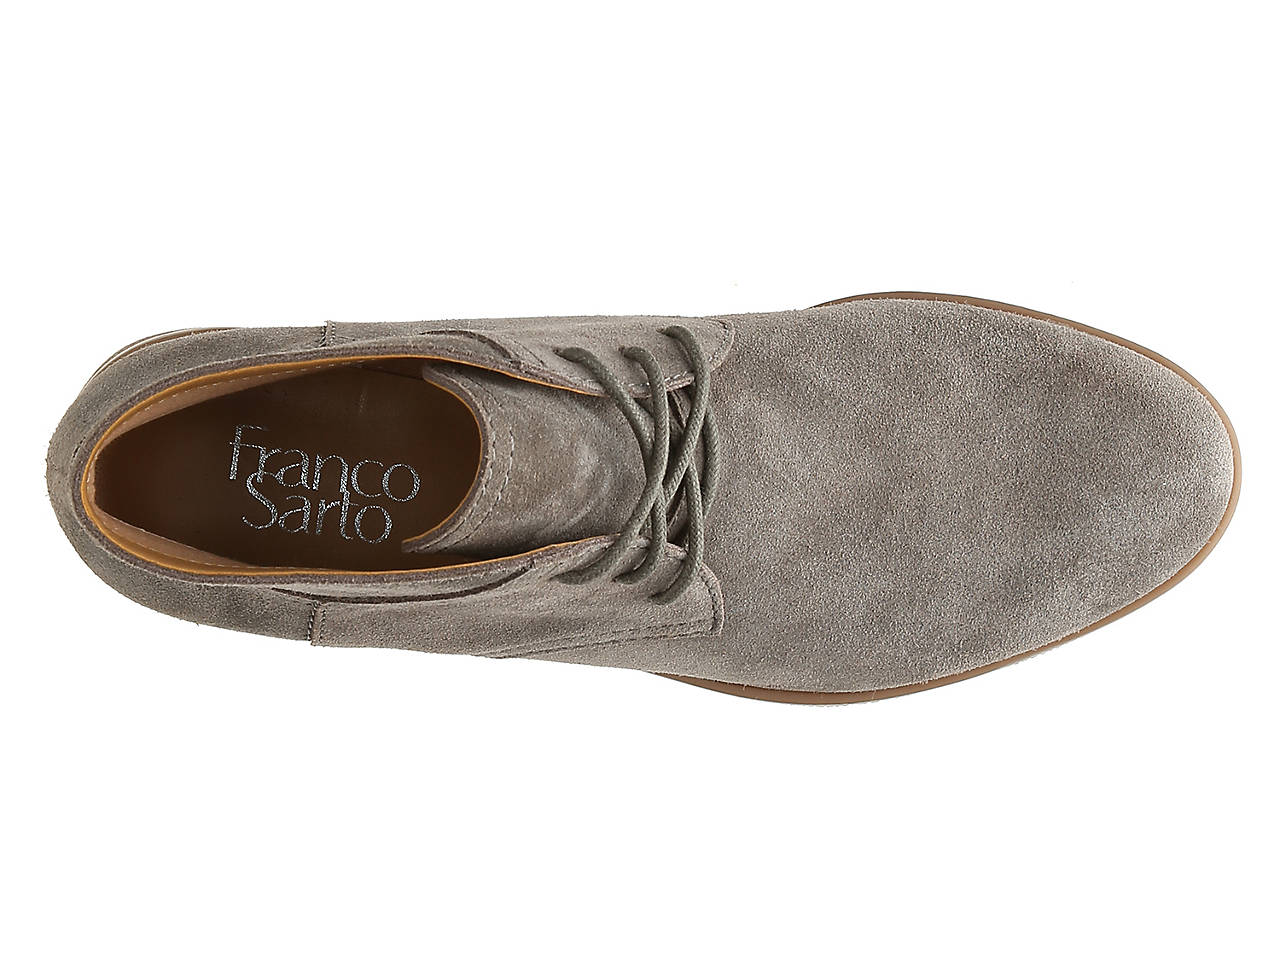 13908cc3fb franco sarto shoe size chart - Style Guru  Fashion